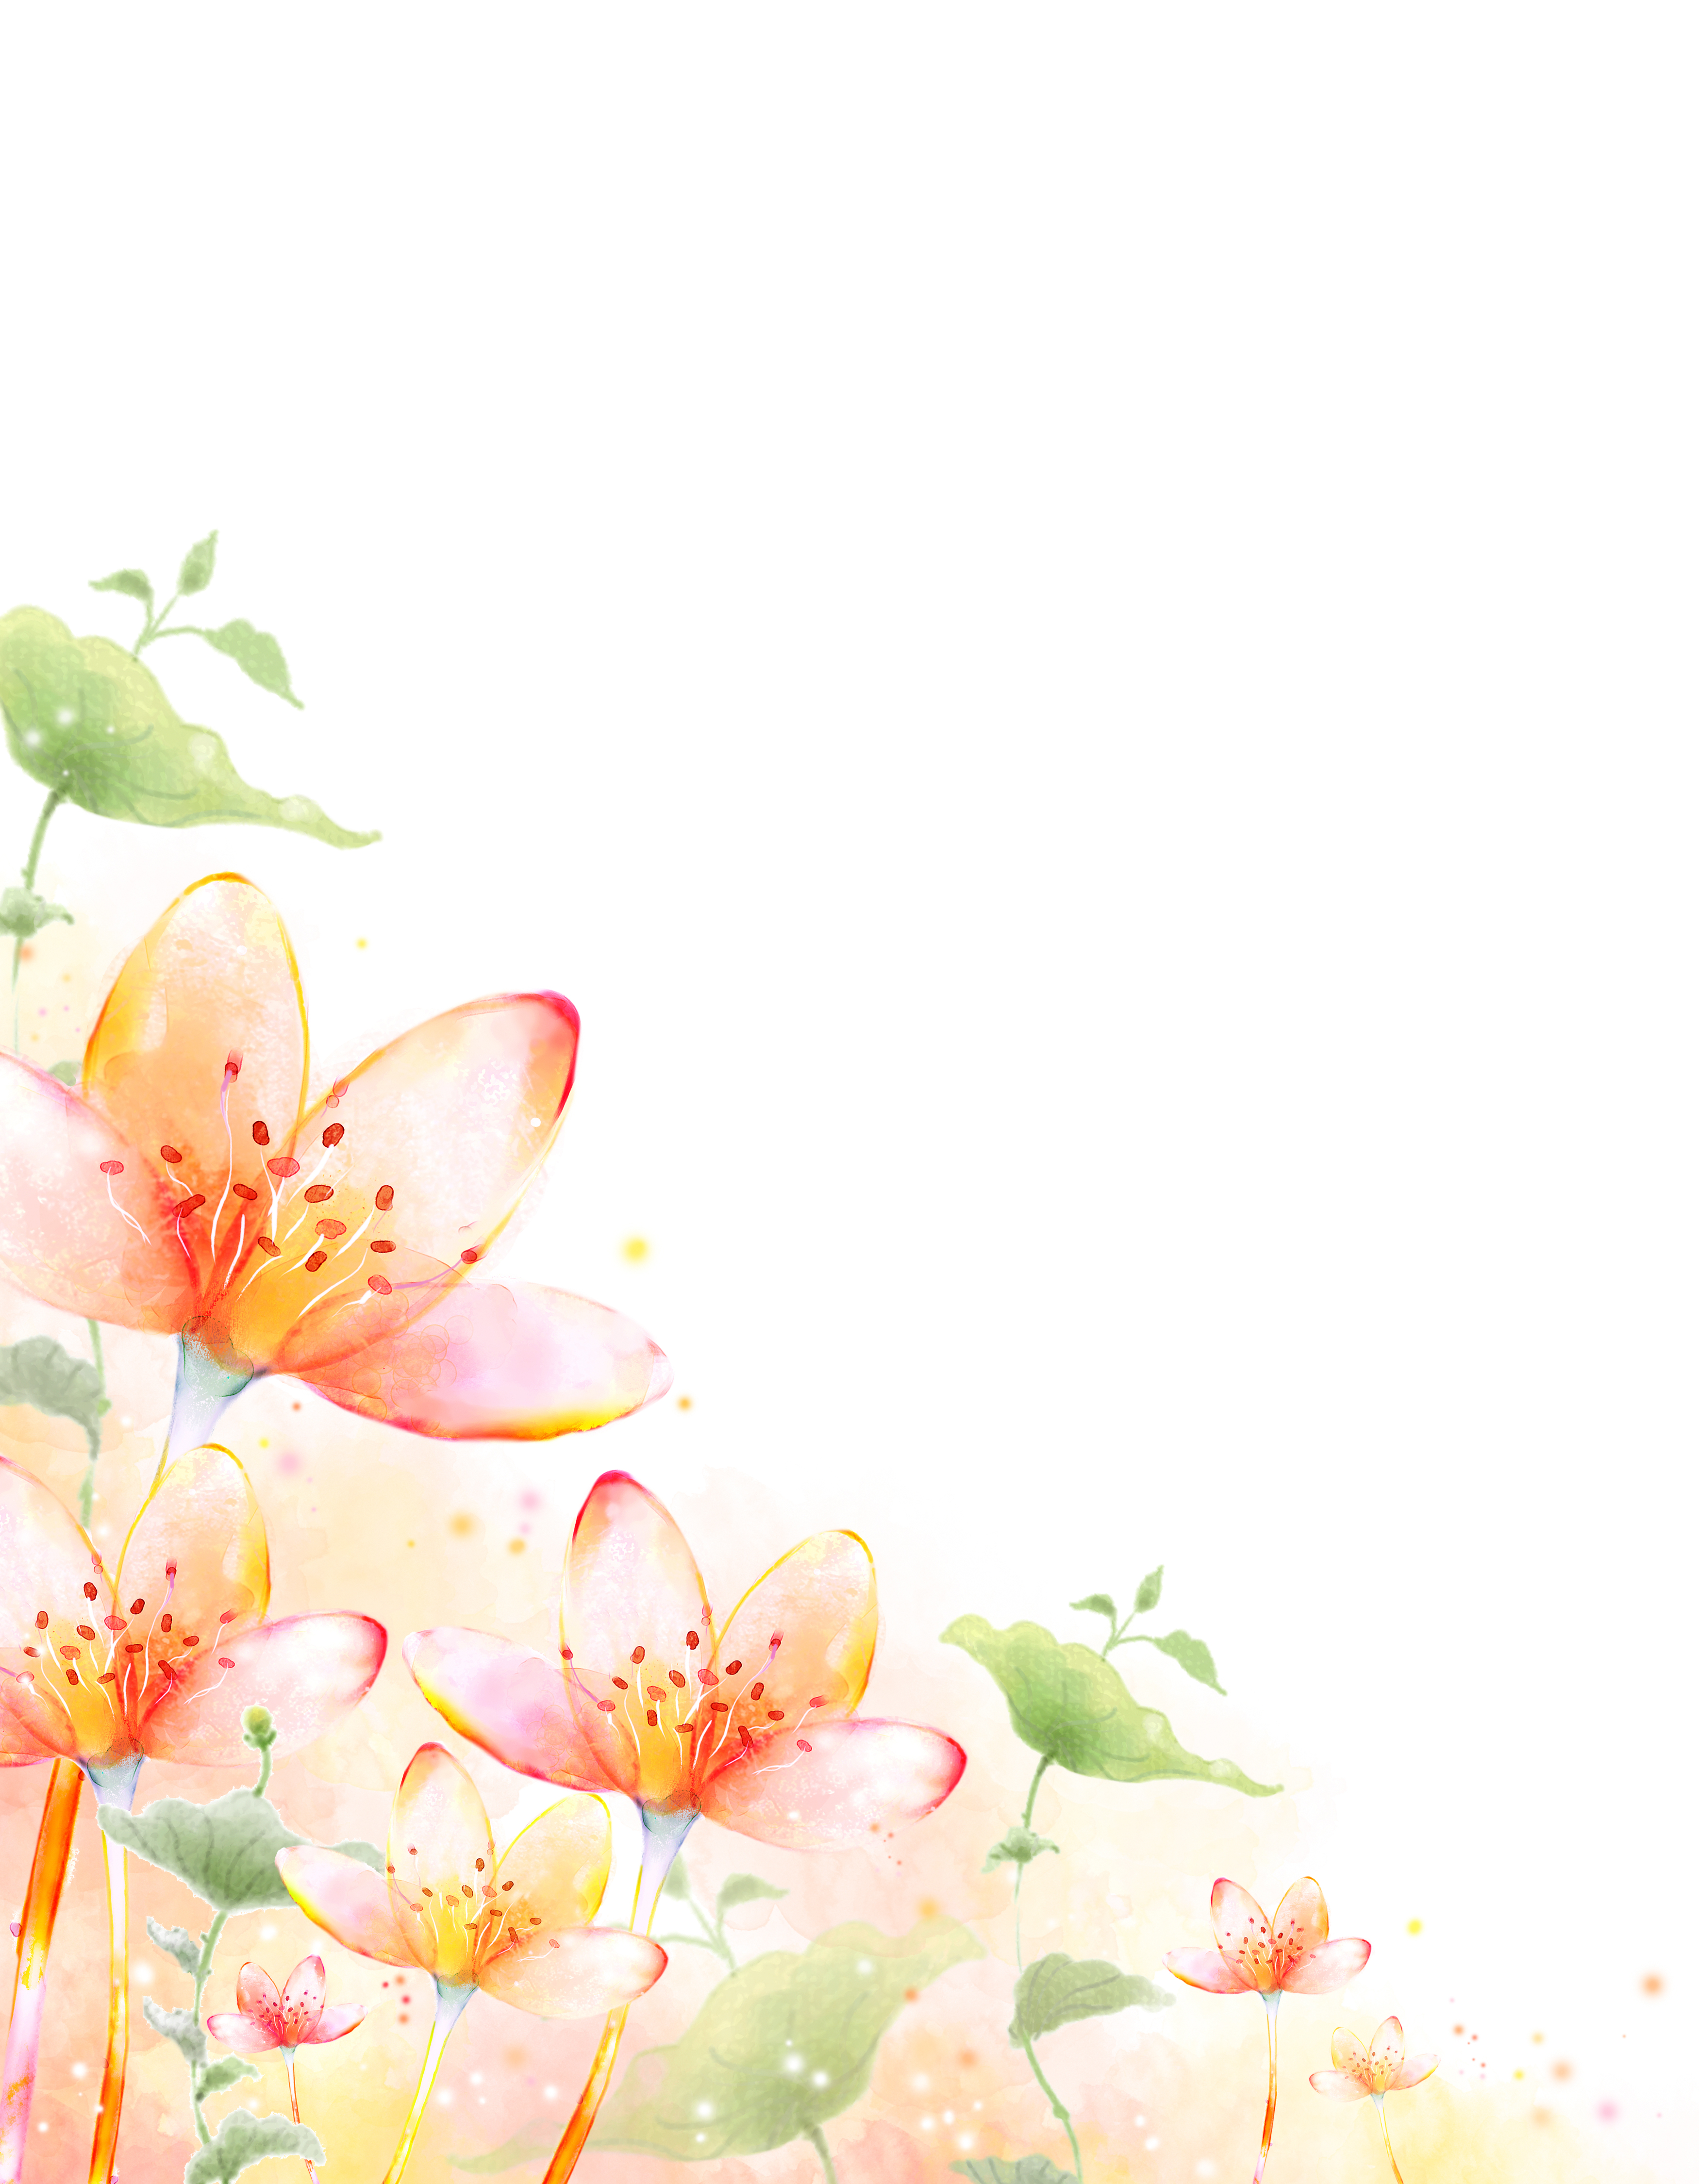 pintado a mano de flores acuarela la impresi u00f3n de fondo